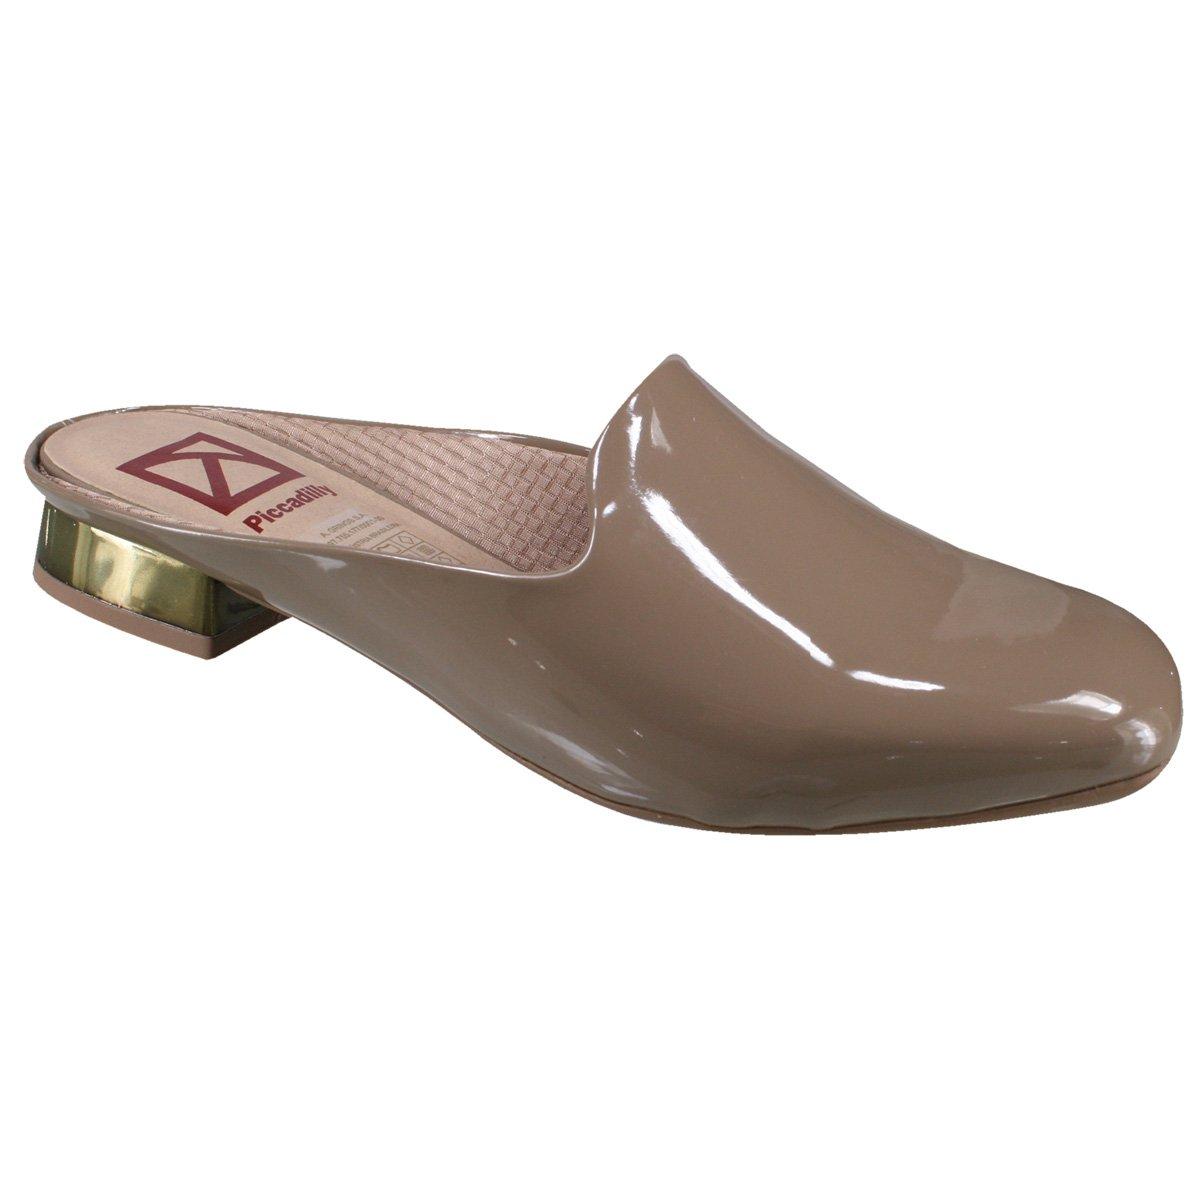 04daca132 Sapato Mule Piccadilly 218001 - Taupe (Verniz) - Calçados Online ...